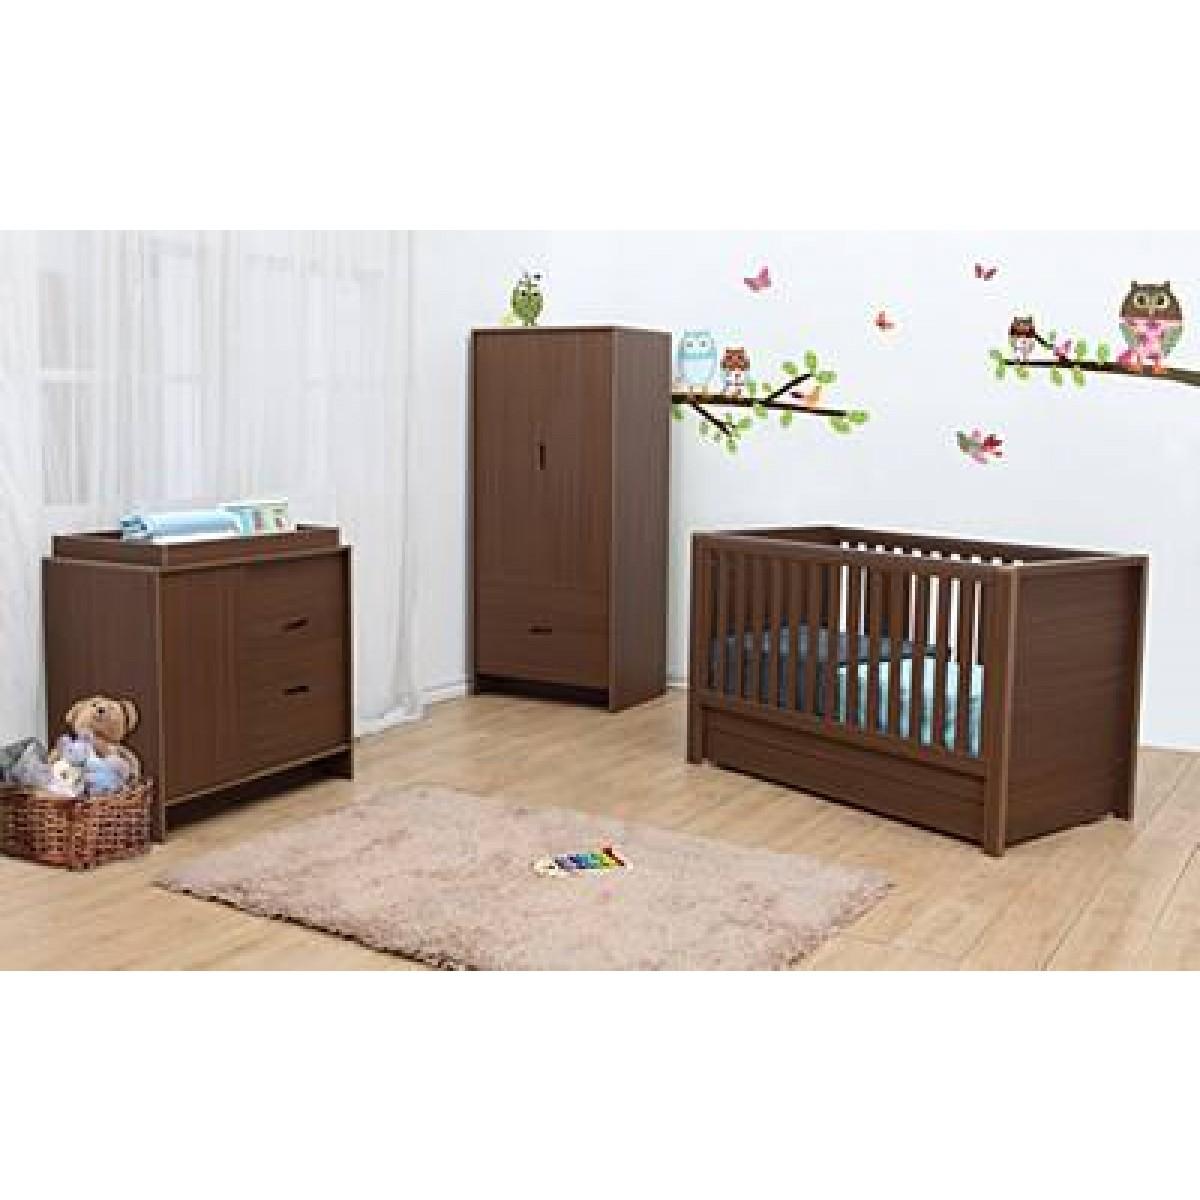 nursery furniture collections uk interior design styles. Black Bedroom Furniture Sets. Home Design Ideas